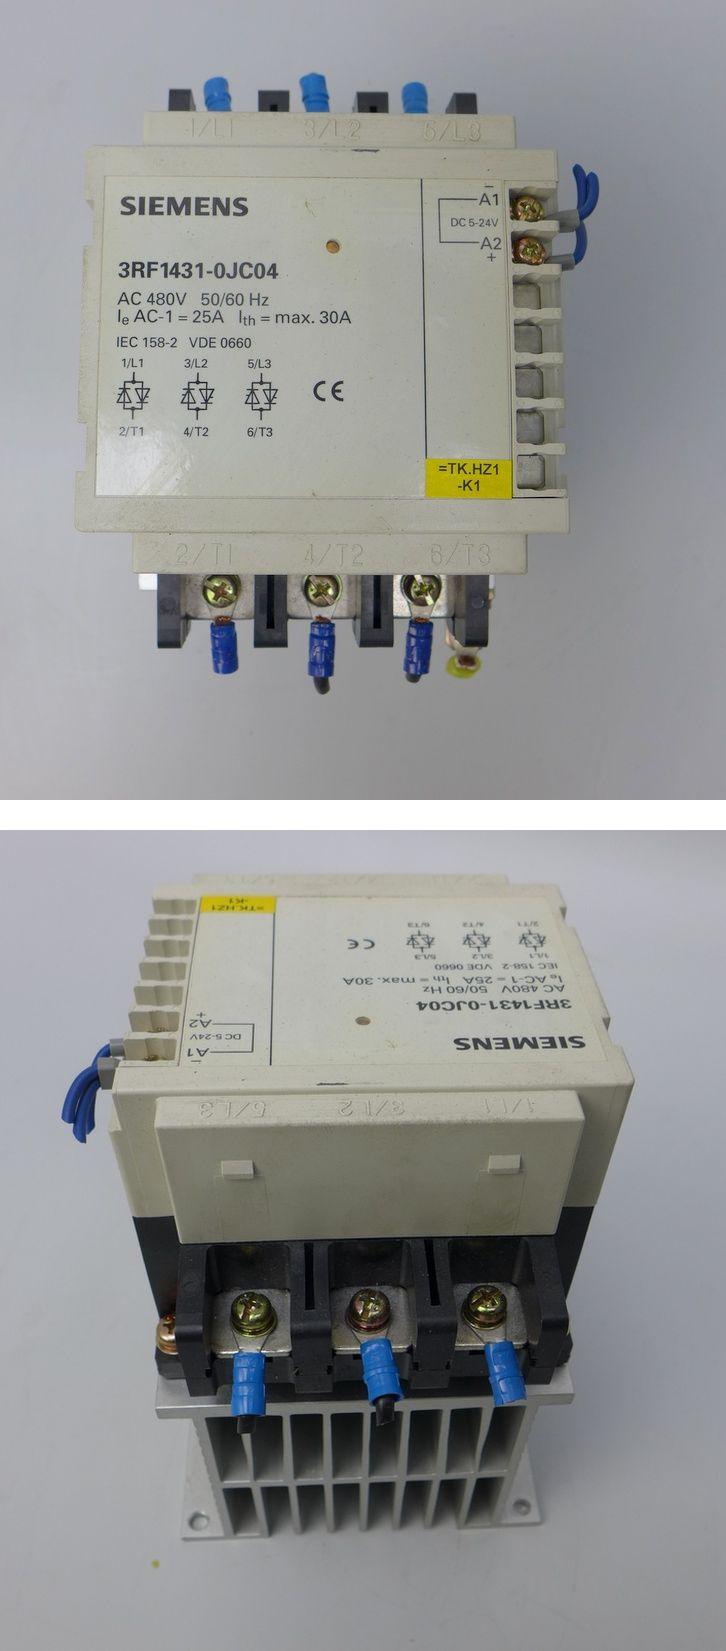 Siemens 3RF1431-0JC04